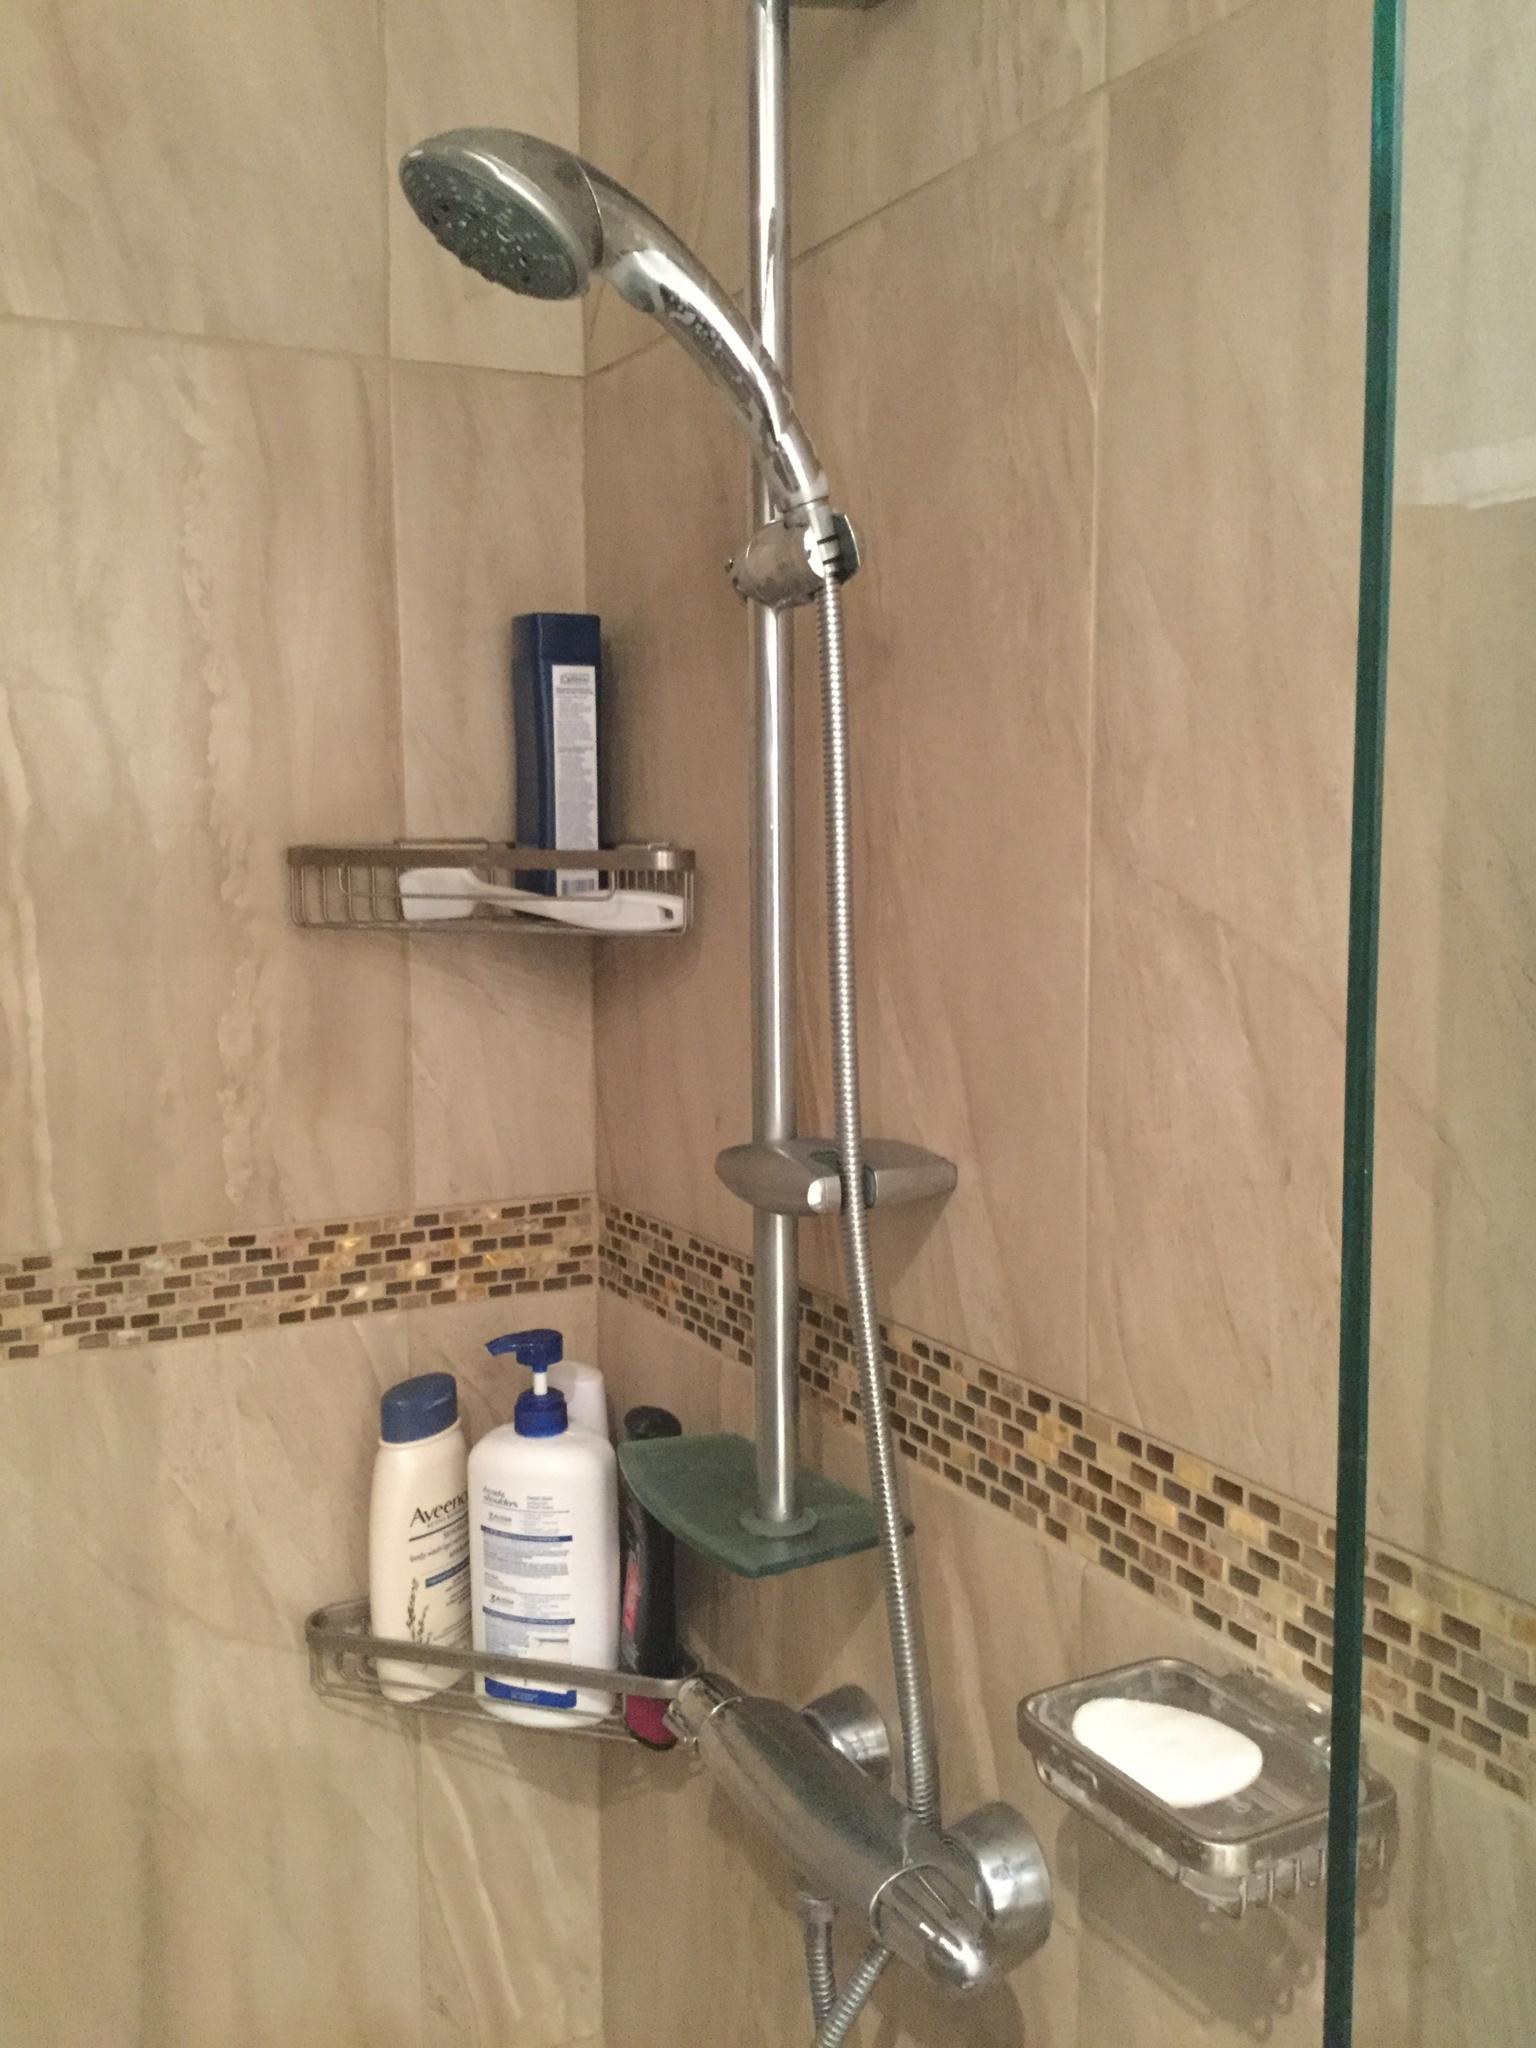 Dorable Grohe Canada Adornment - Bathtubs For Small Bathrooms ...